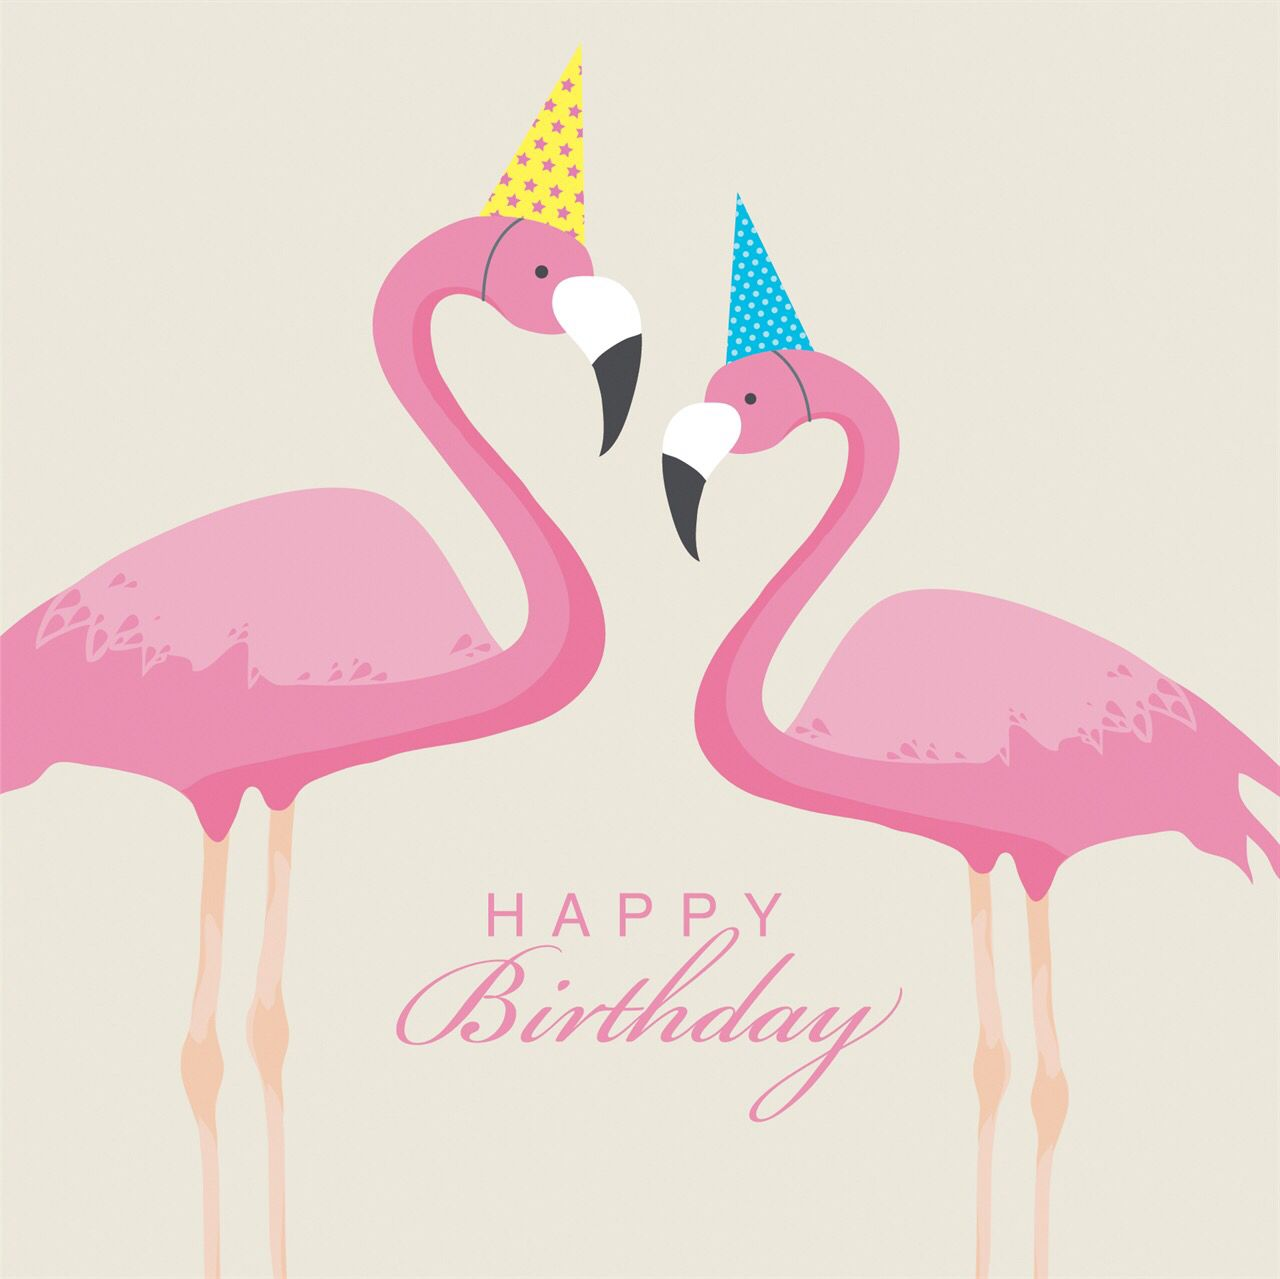 hbd flamingo feliz cumple pinterest felicitaciones felicitacion cumplea os y cumplea os. Black Bedroom Furniture Sets. Home Design Ideas